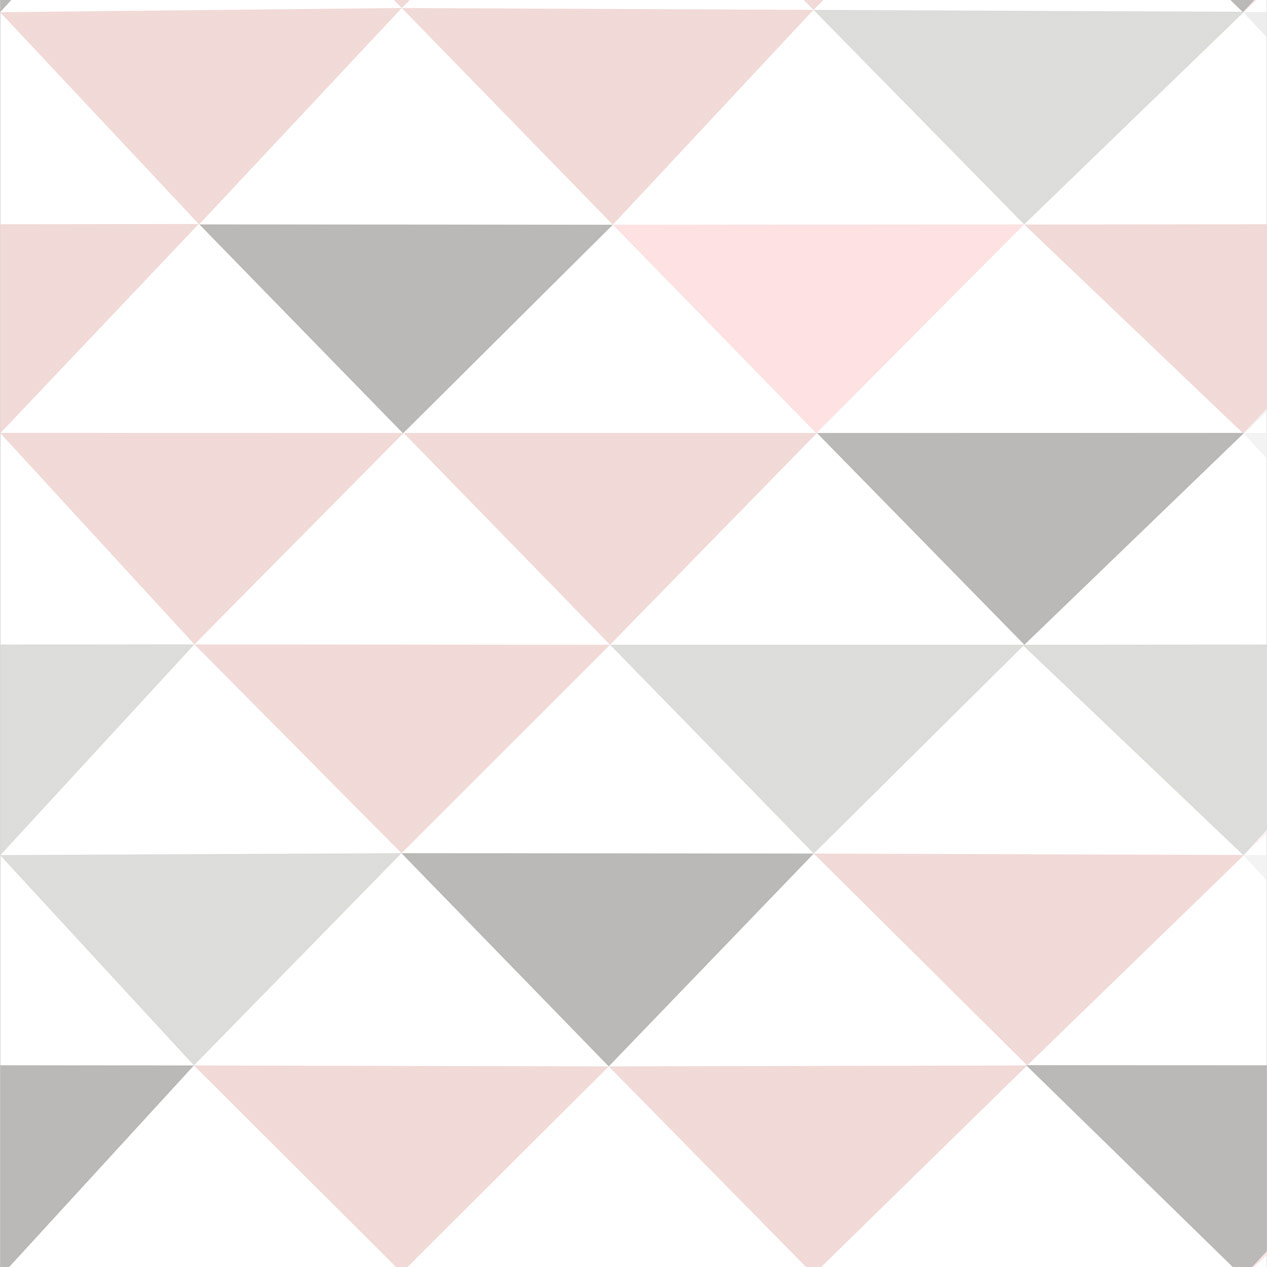 Papel de Parede Geométrico Triângulo Rosa Branco e Cinza